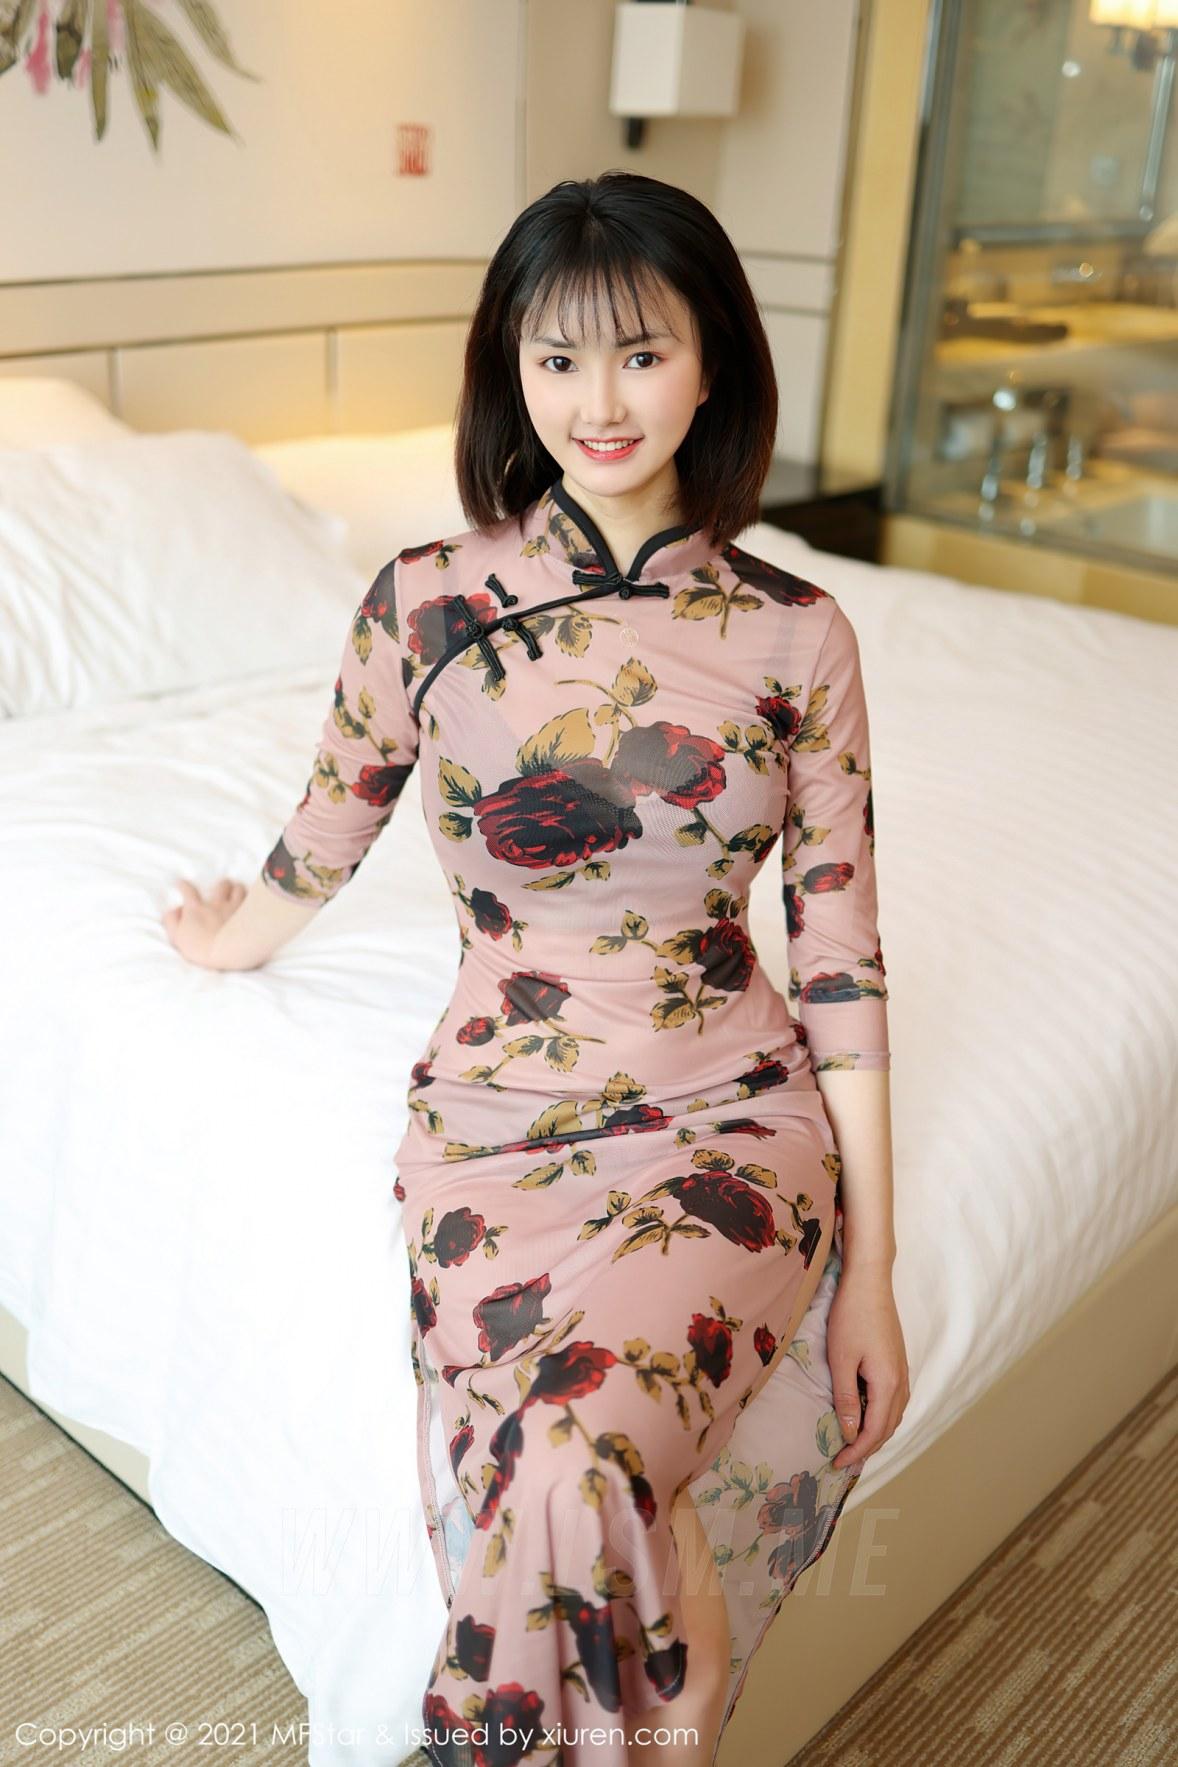 MFStar 模范学院 Vol.483 肉感妹子古典旗袍  墨韩 新人模特... - 4